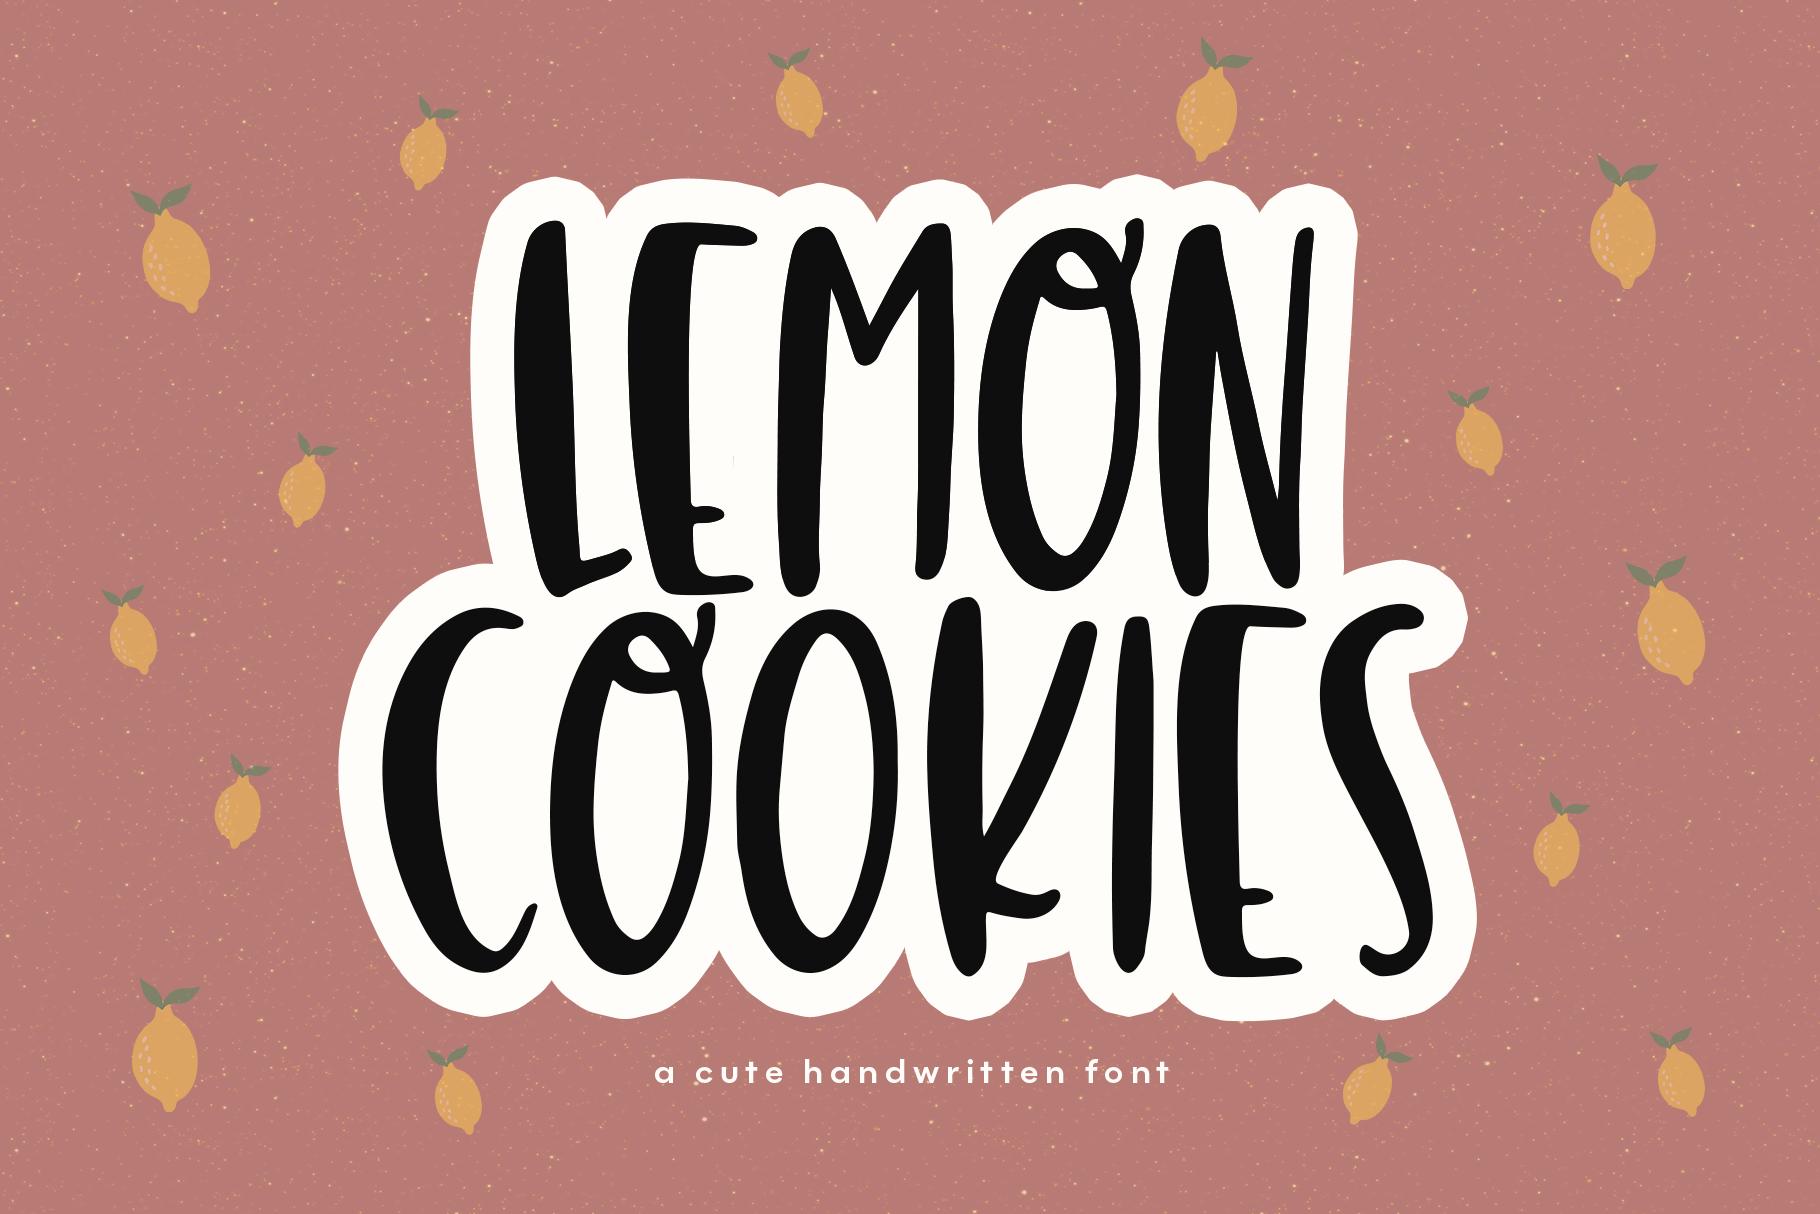 Lemon Cookies - A Fun Handwritten Font example image 1